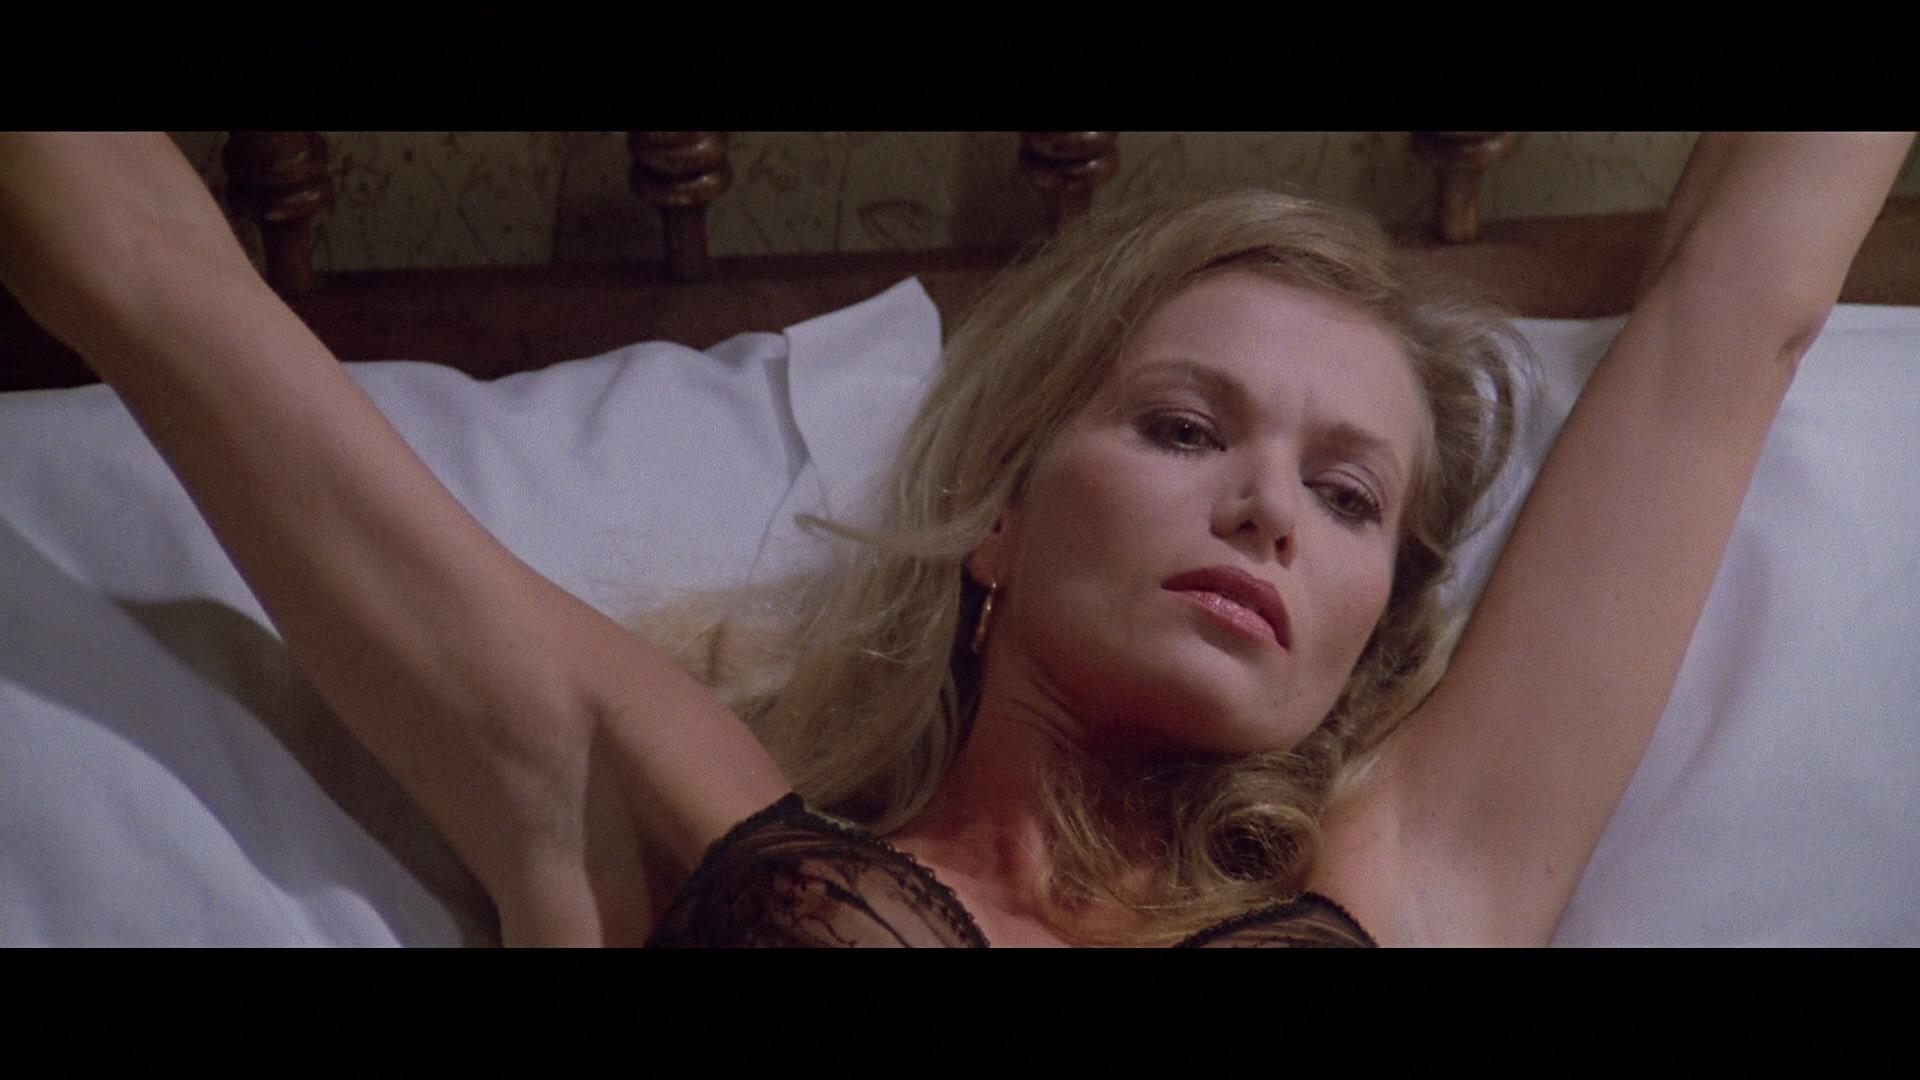 Alexandra ross her scenes fam immerscharf 8